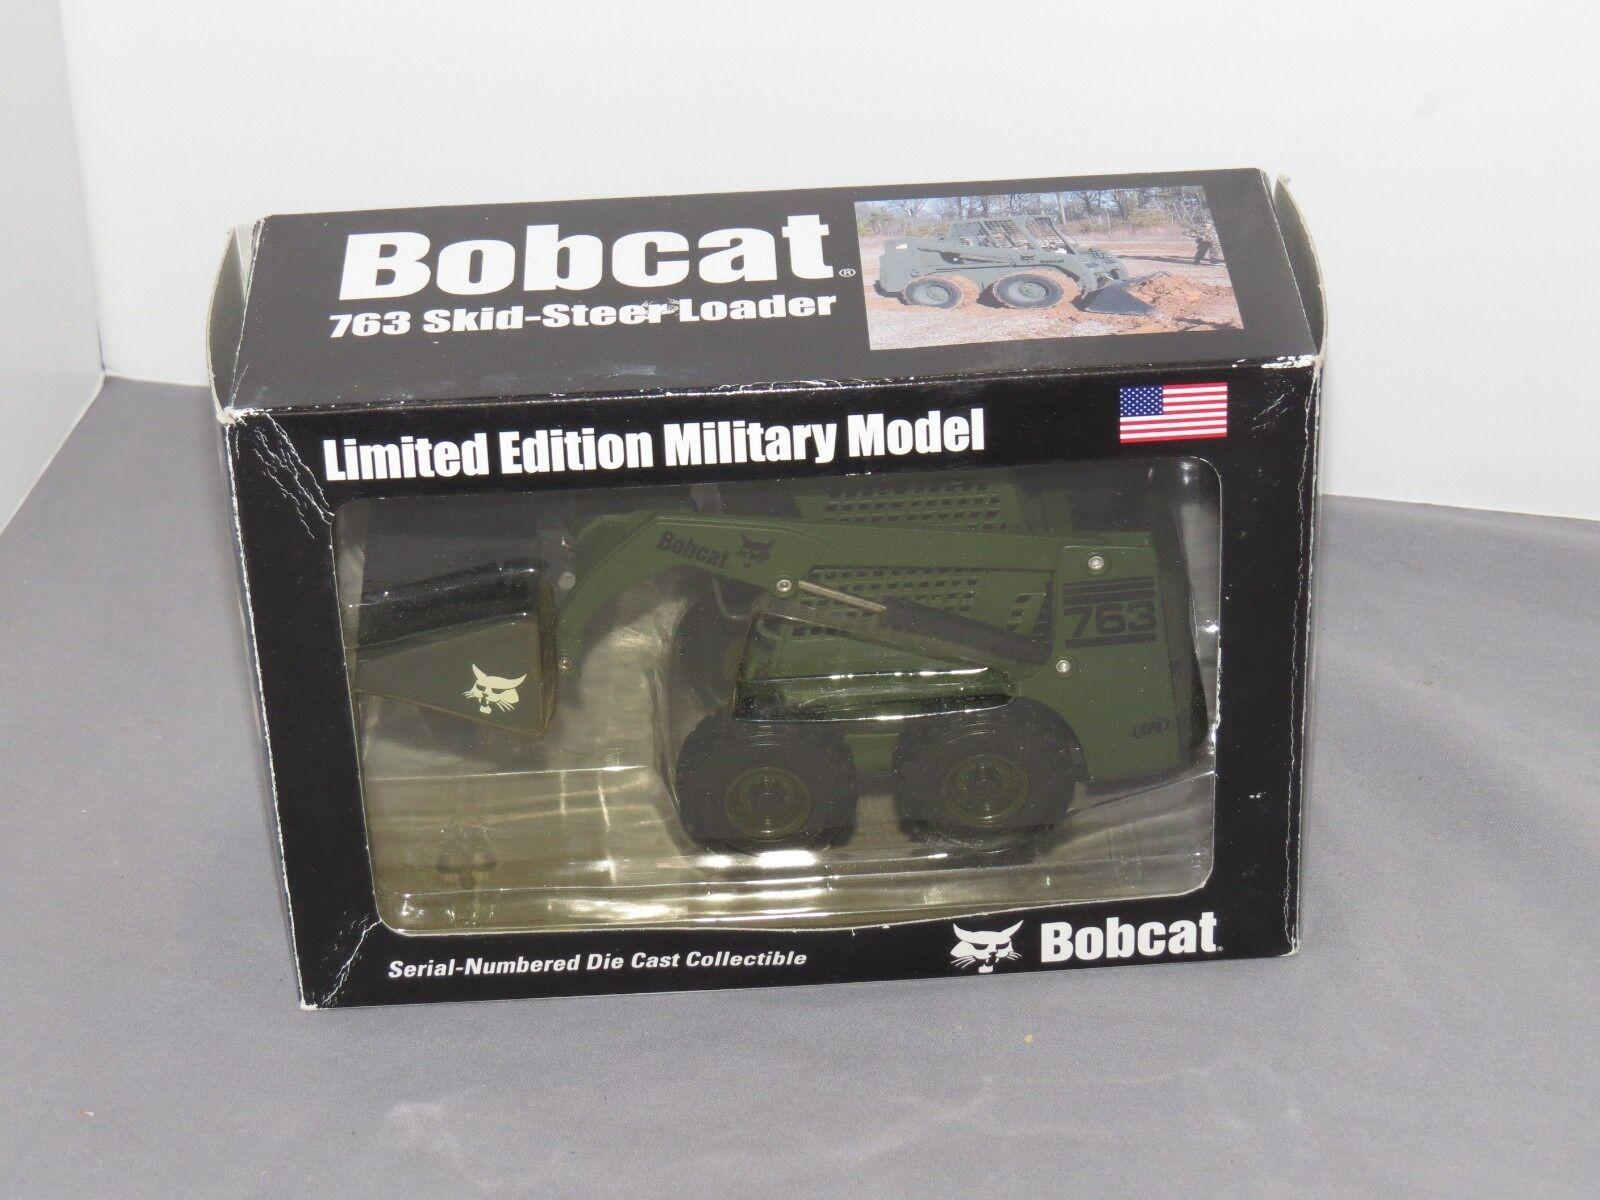 Vintage Bobcat 763 Loader Military Version 1 25 Scale Diecast Model NIB RARE